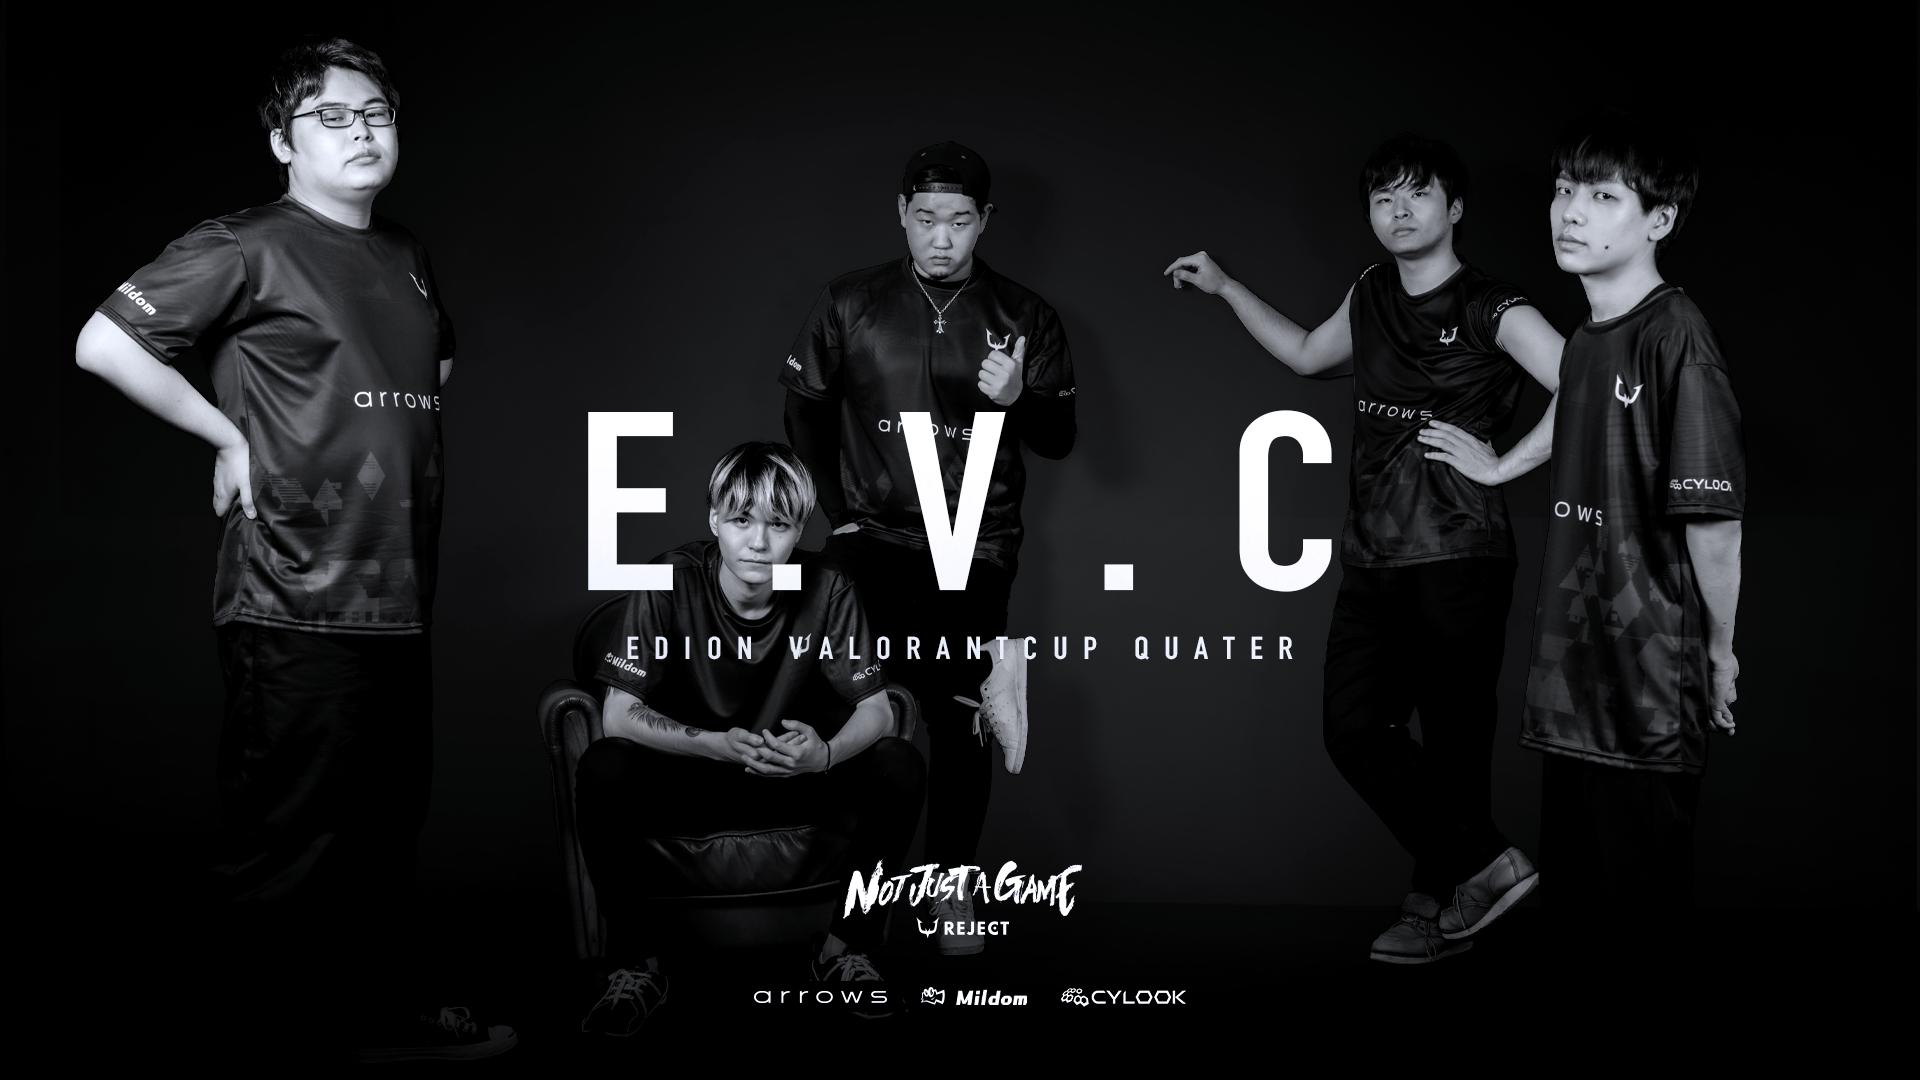 【VALORANT】国内初オフライン大会『EDION VALORANT CUP』出場